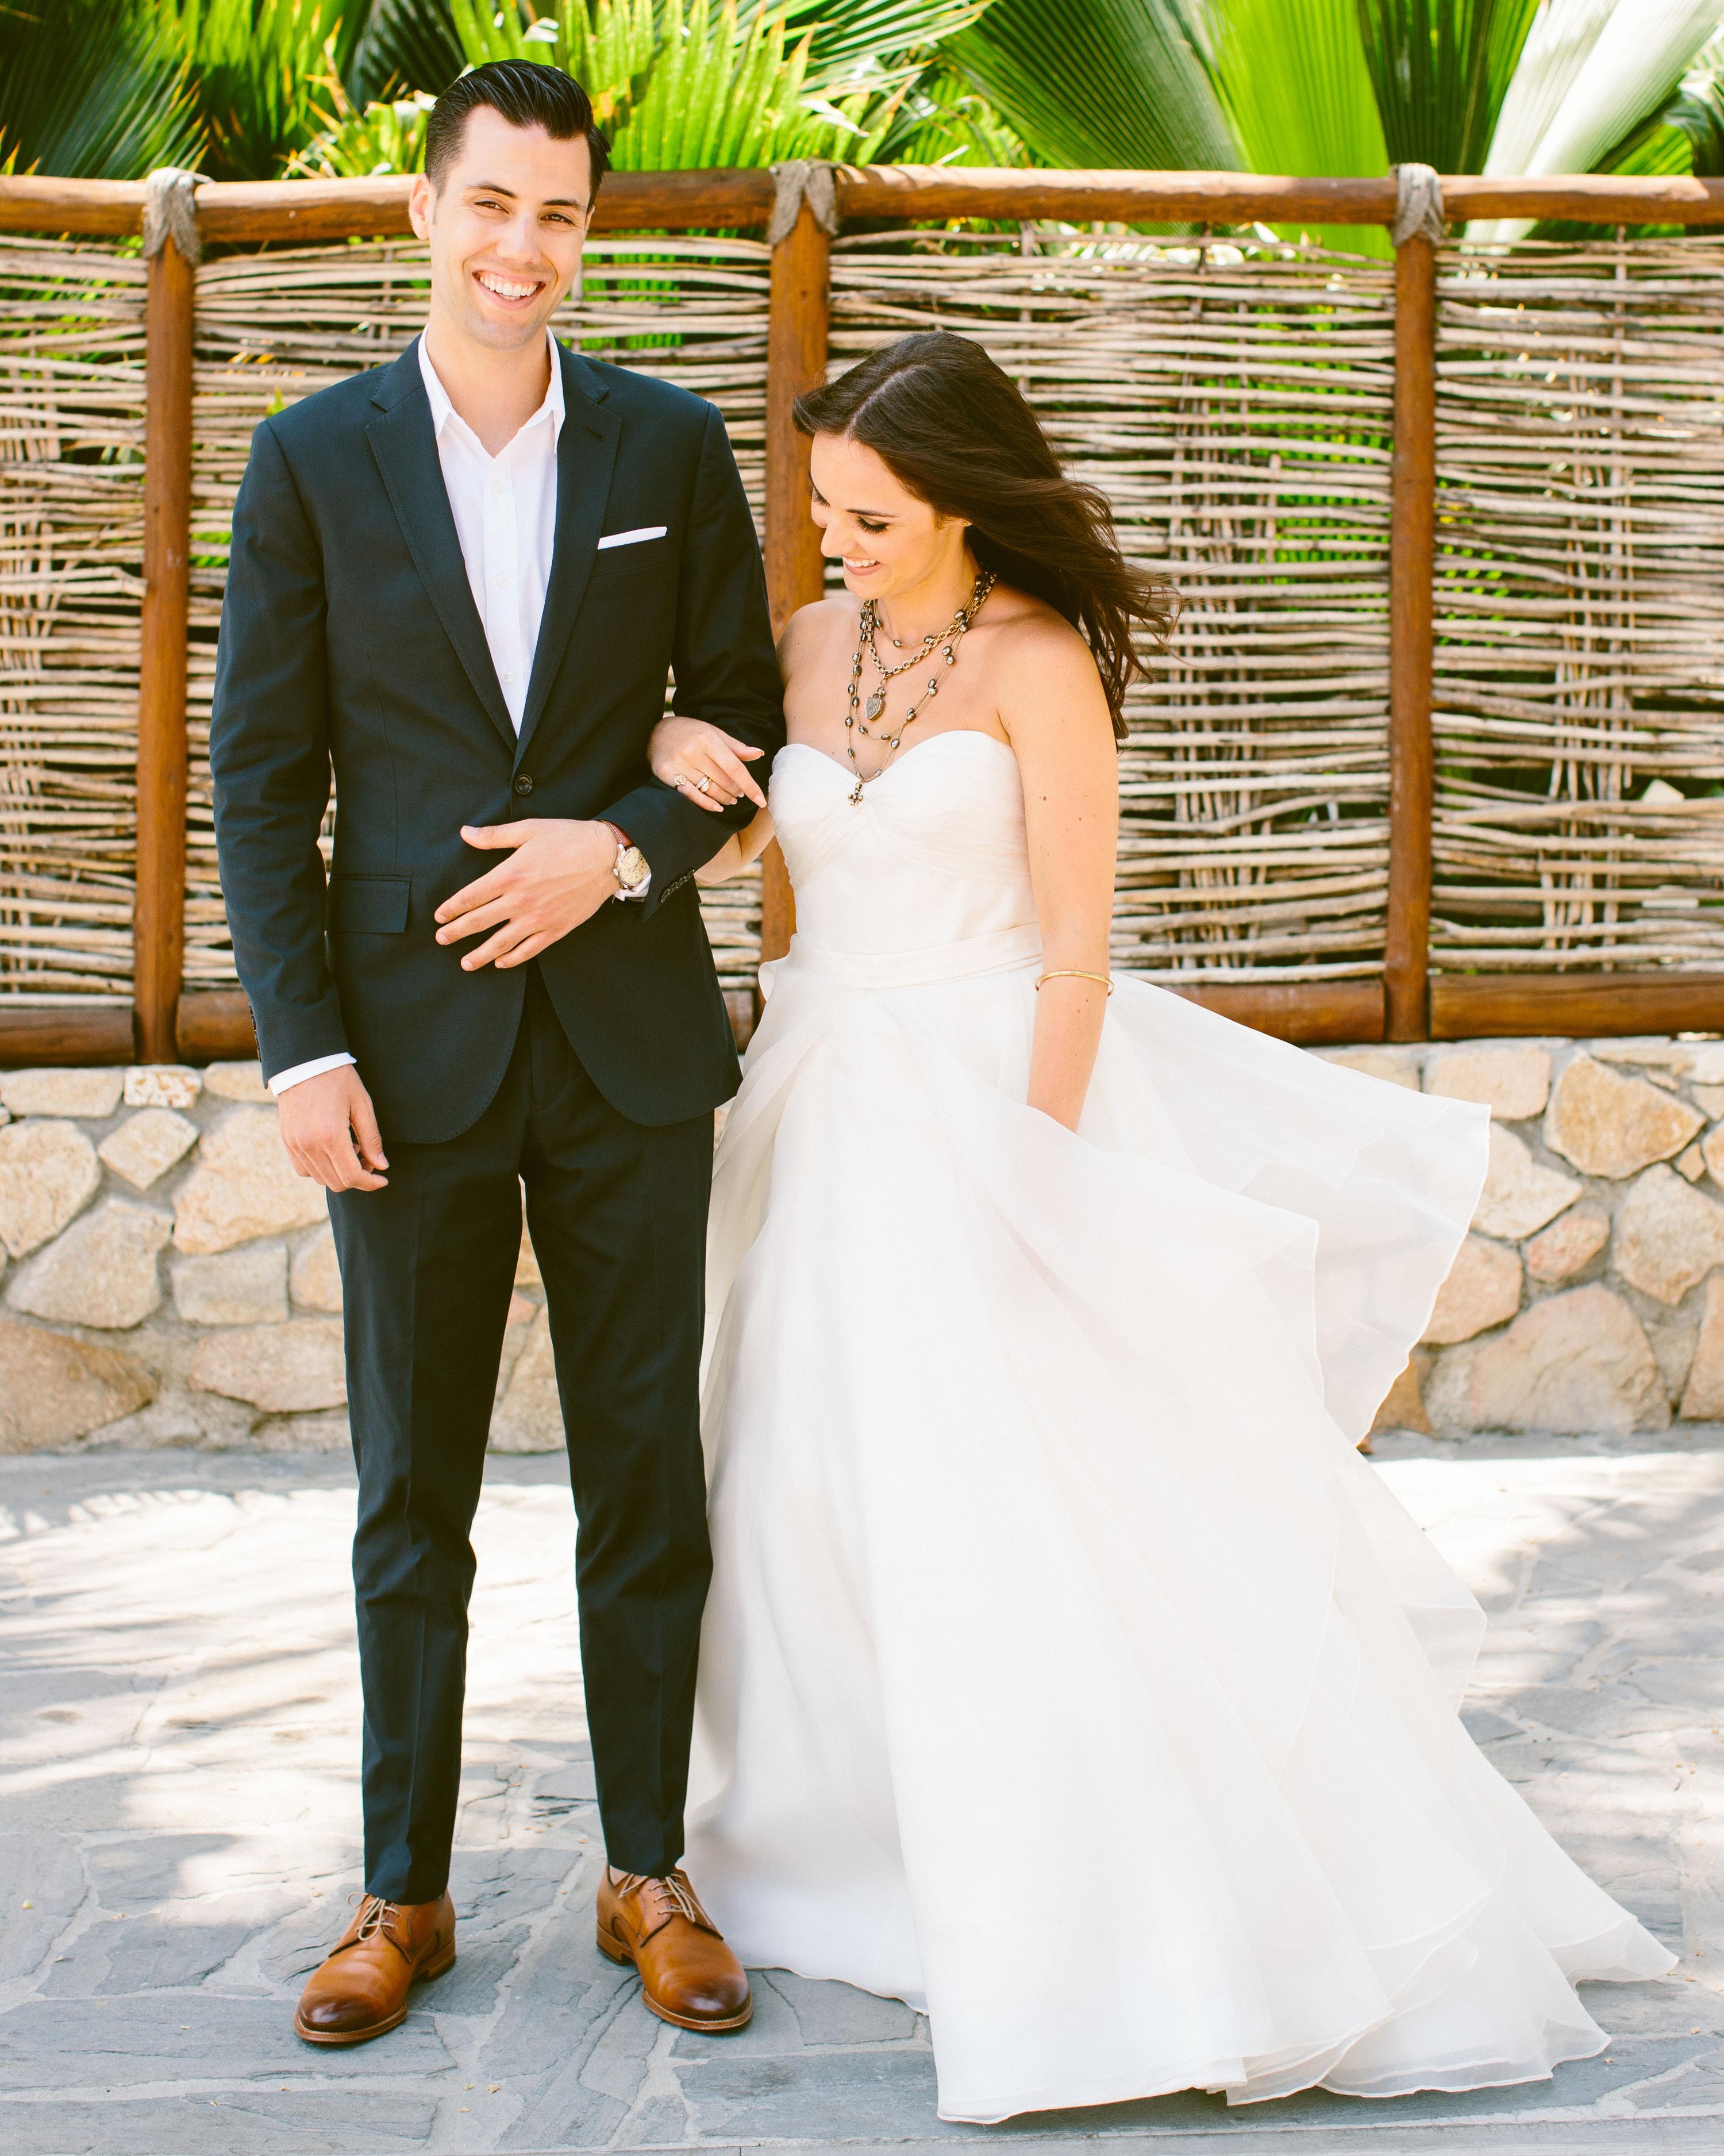 ali-jess-wedding-couple-047-002-s111717-1214.jpg